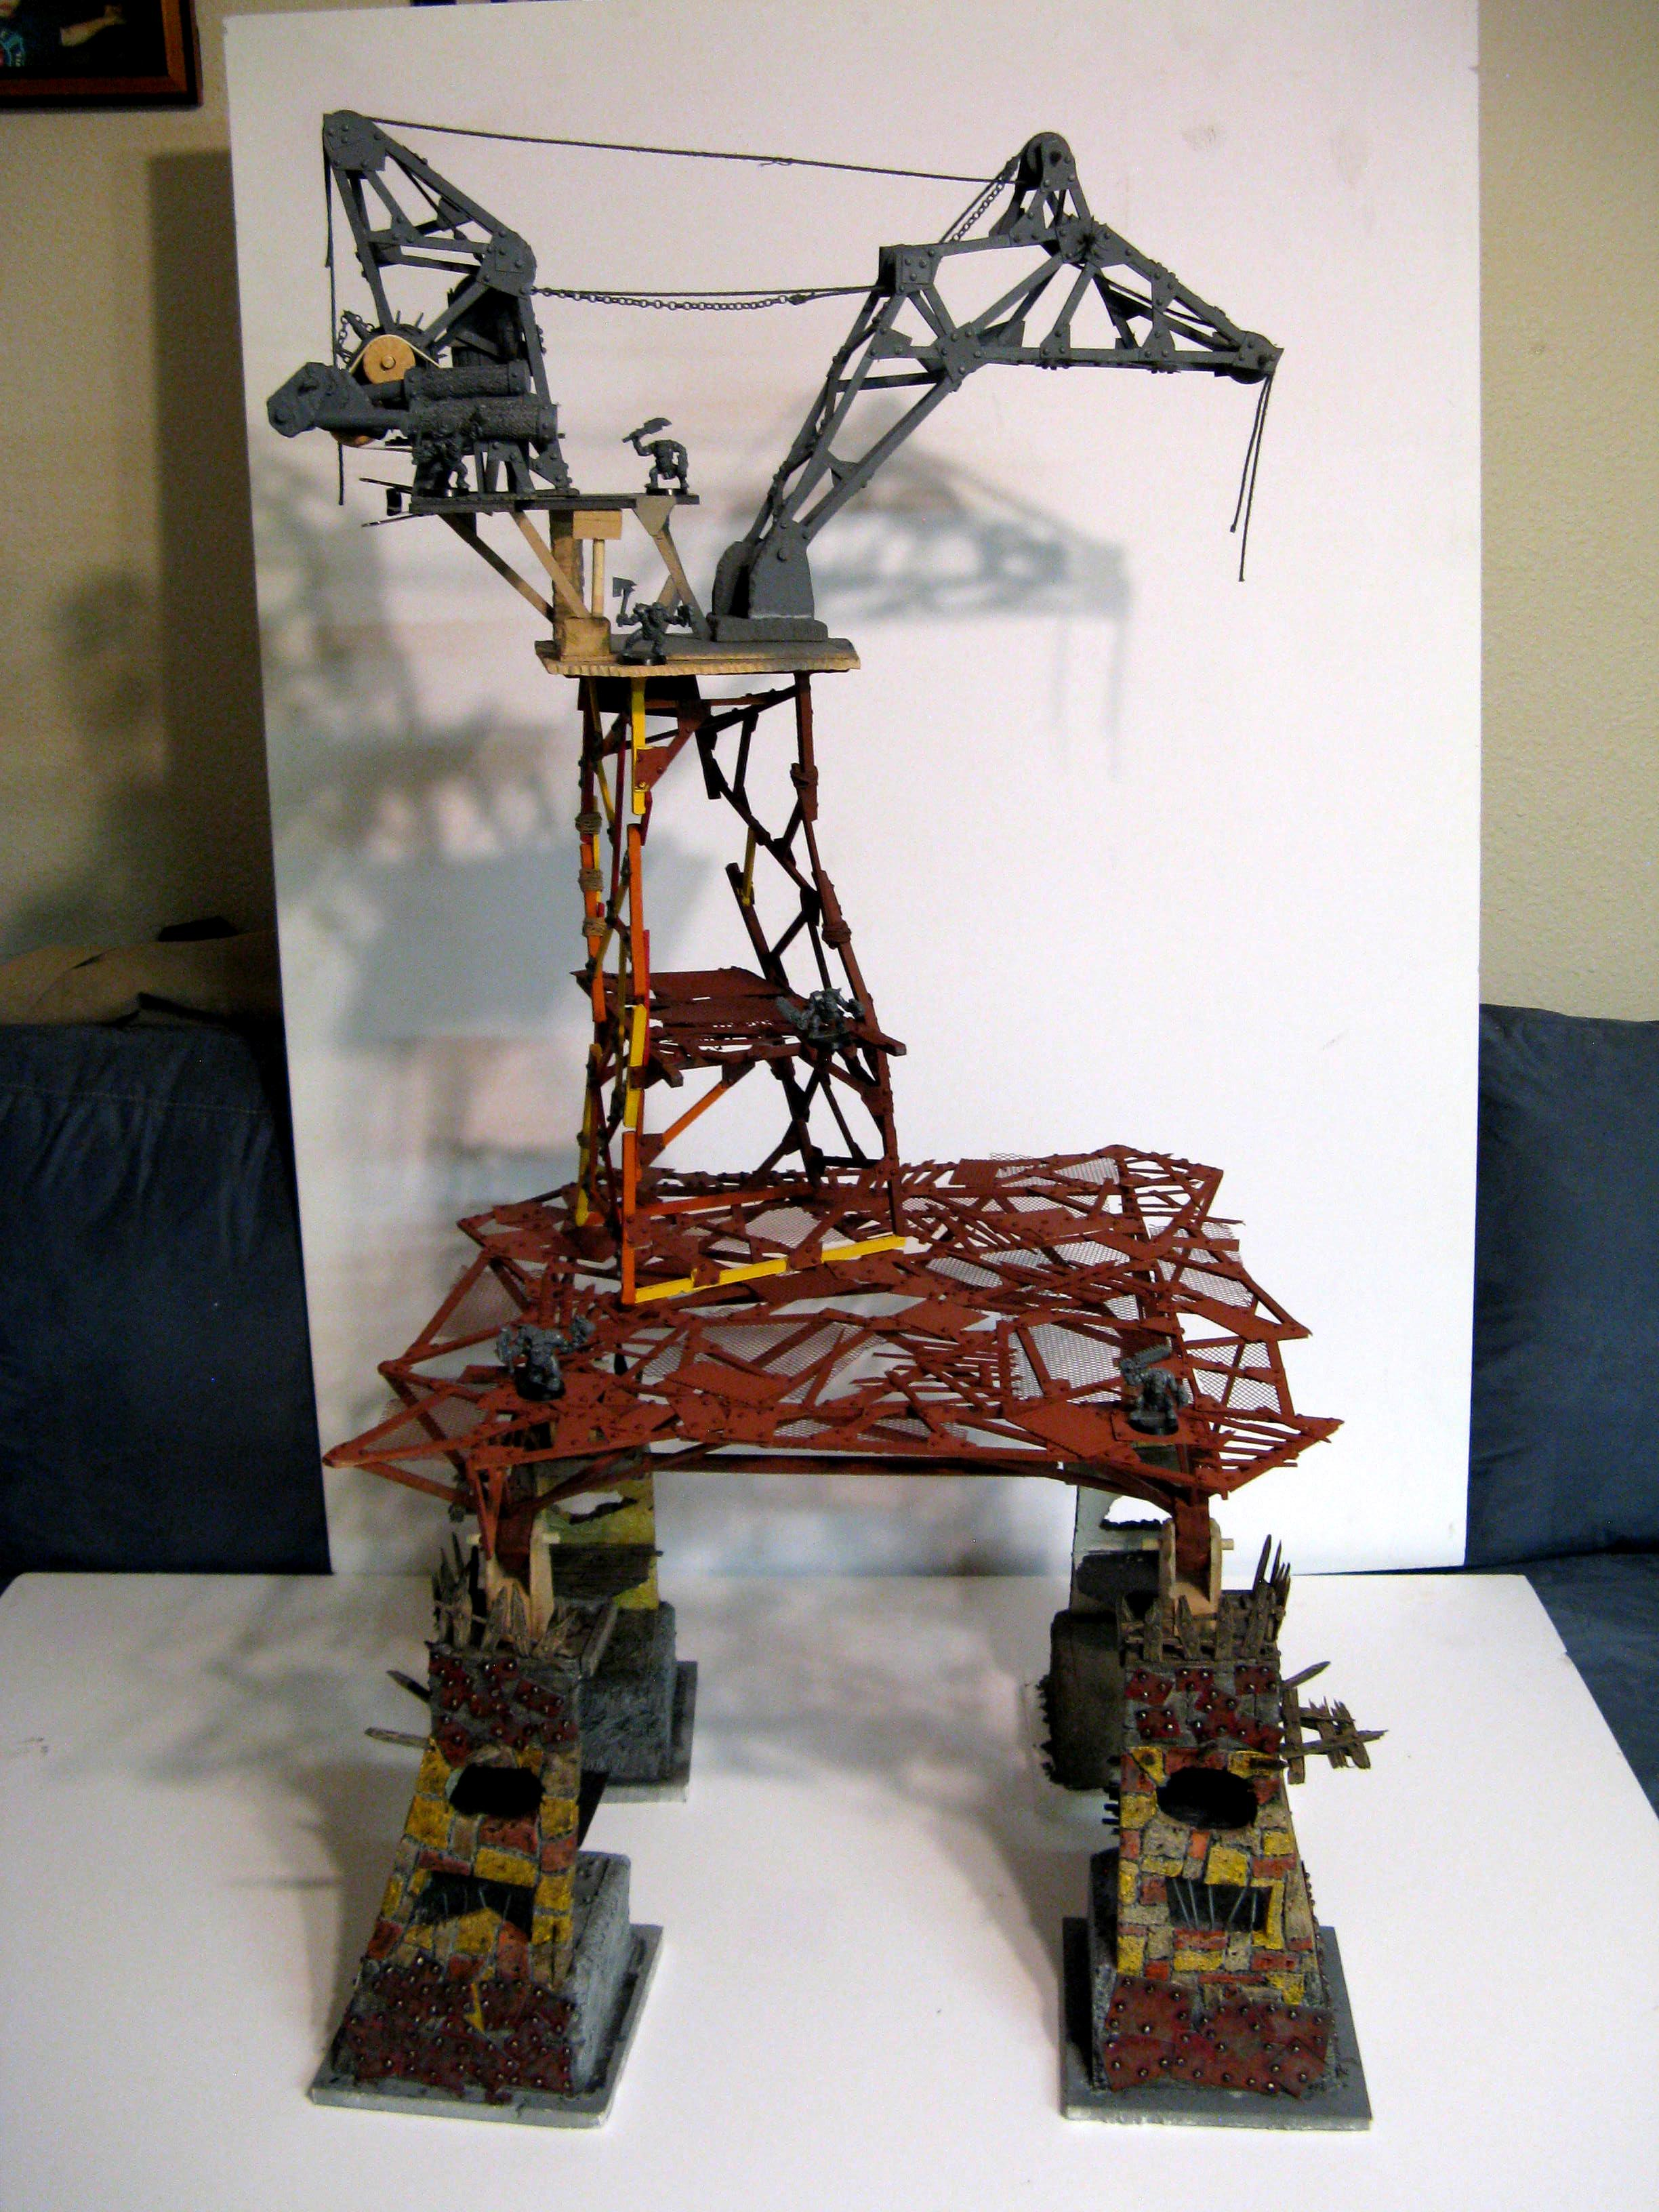 Crane, Fort, Fortification, Hure, Large, Modular, Orks, Ramshackle, Tall, Terrain, Tower